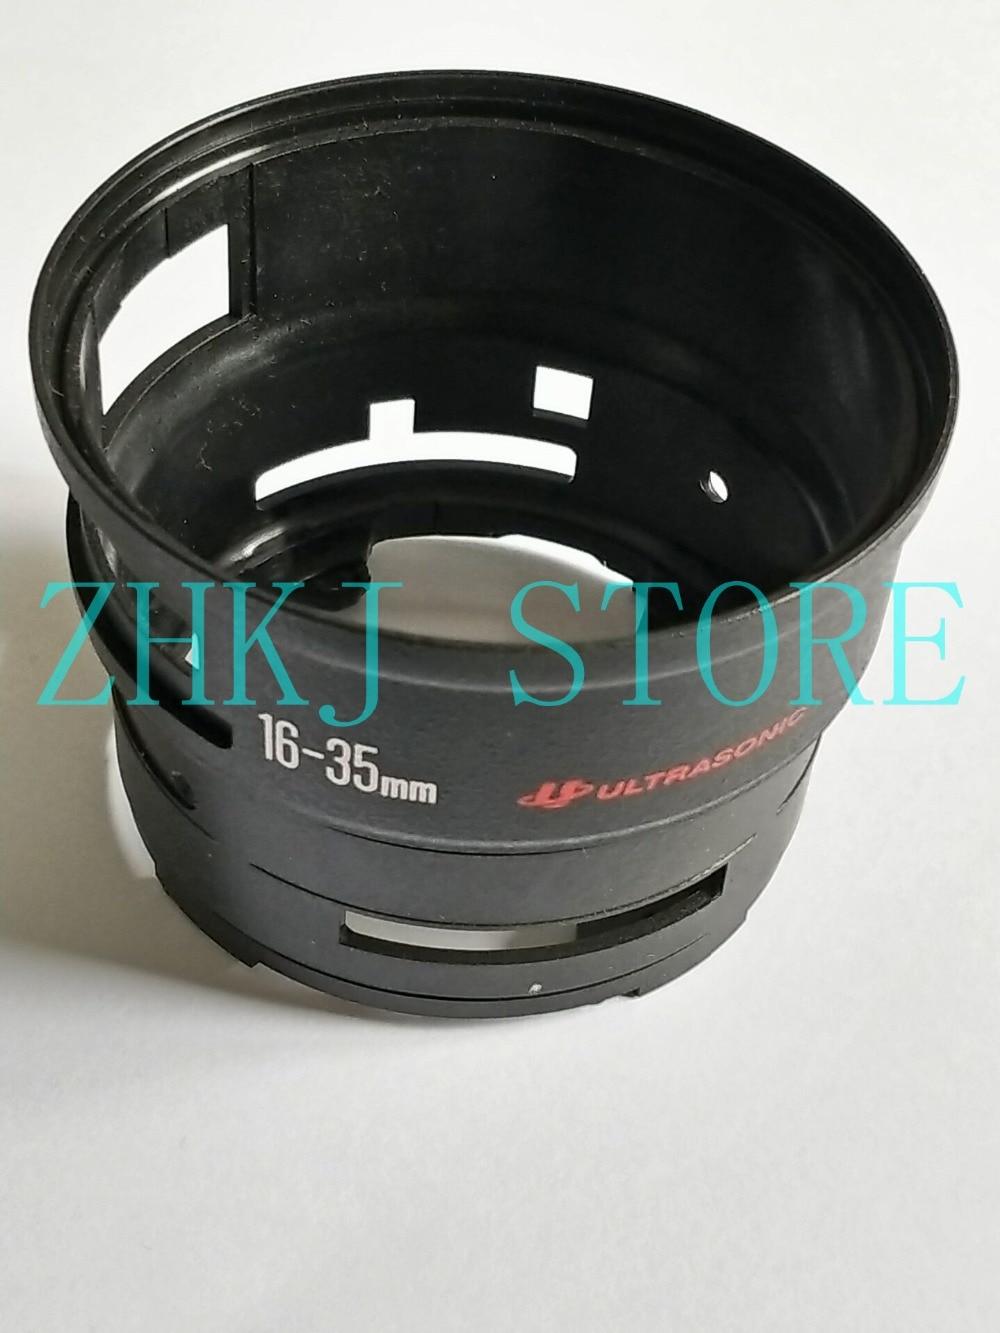 Neue Original Barrel Ring Befestigt HÜLSE ASSY label zylinder körper für Canon 16-35mm 16-35 F /2,8 II Objektiv reparatur teil